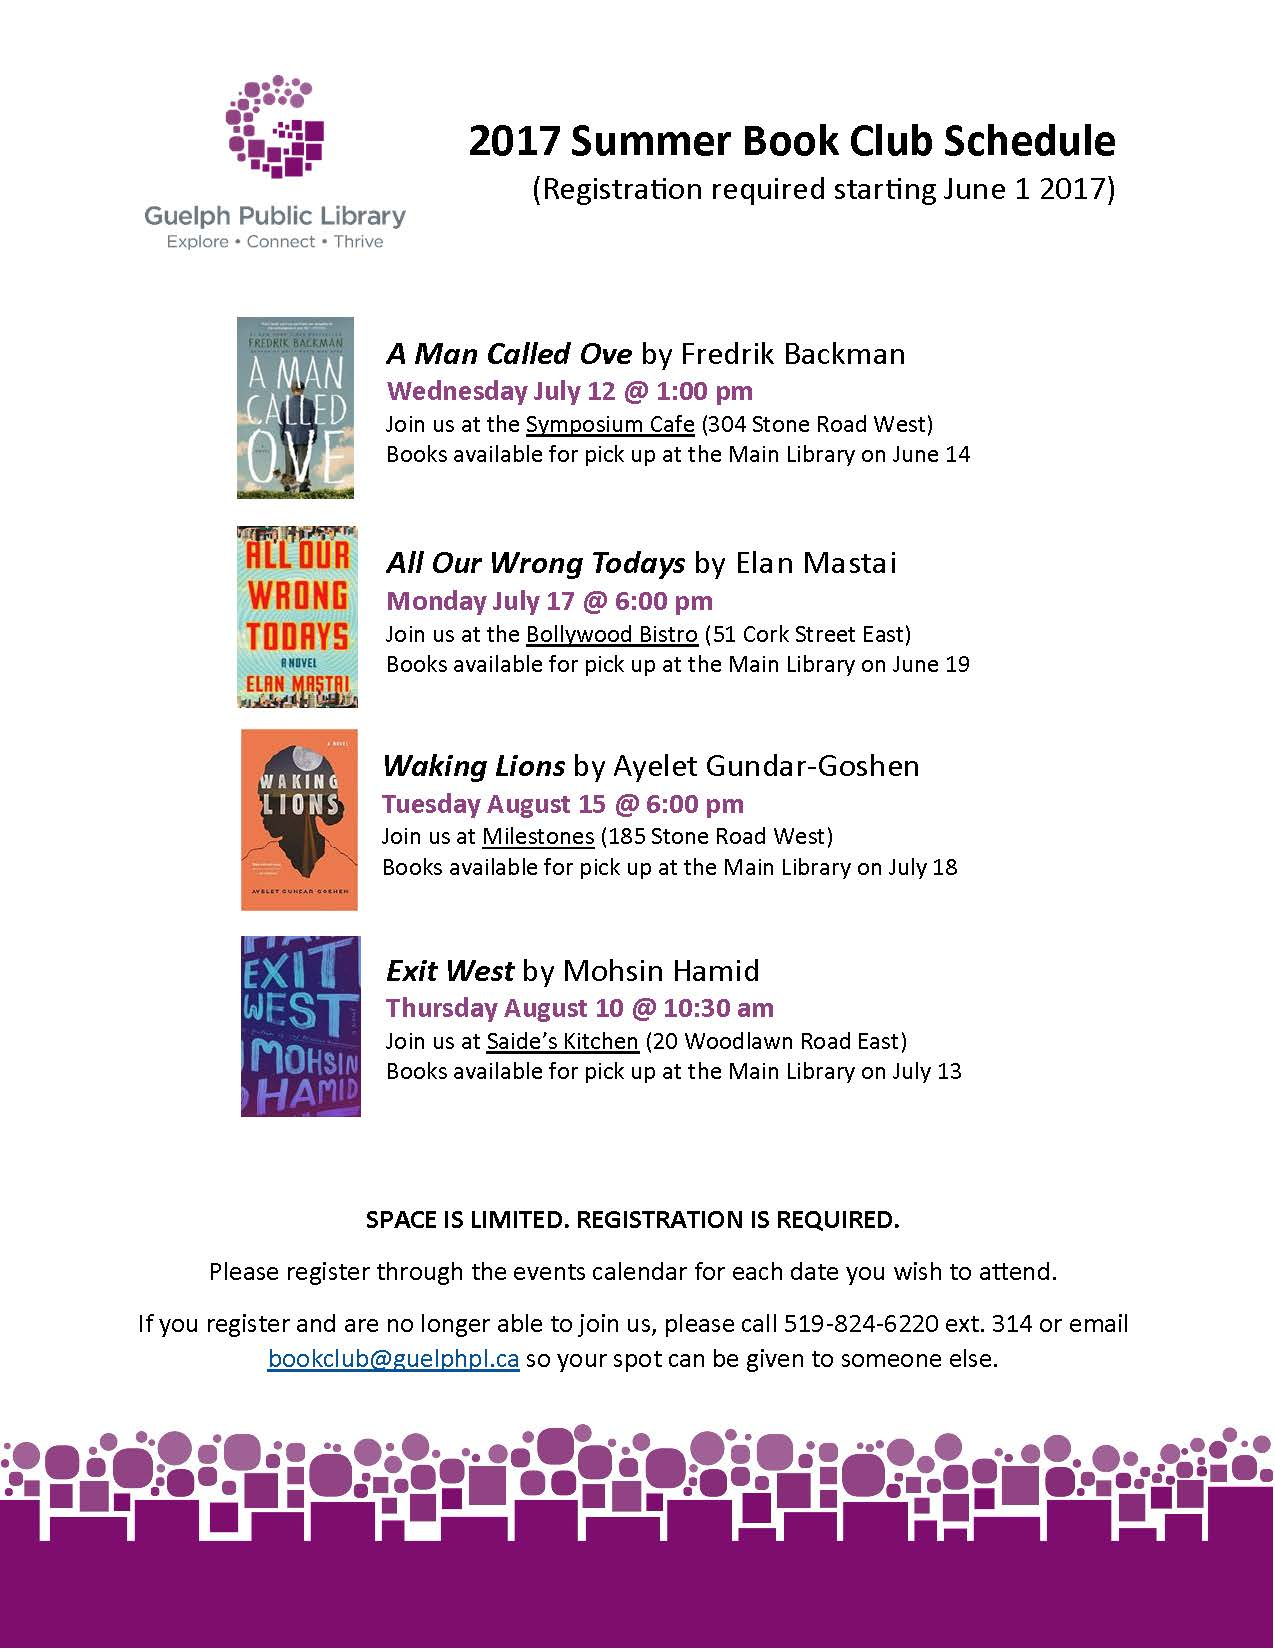 2017 Adult Summer Book Clubs